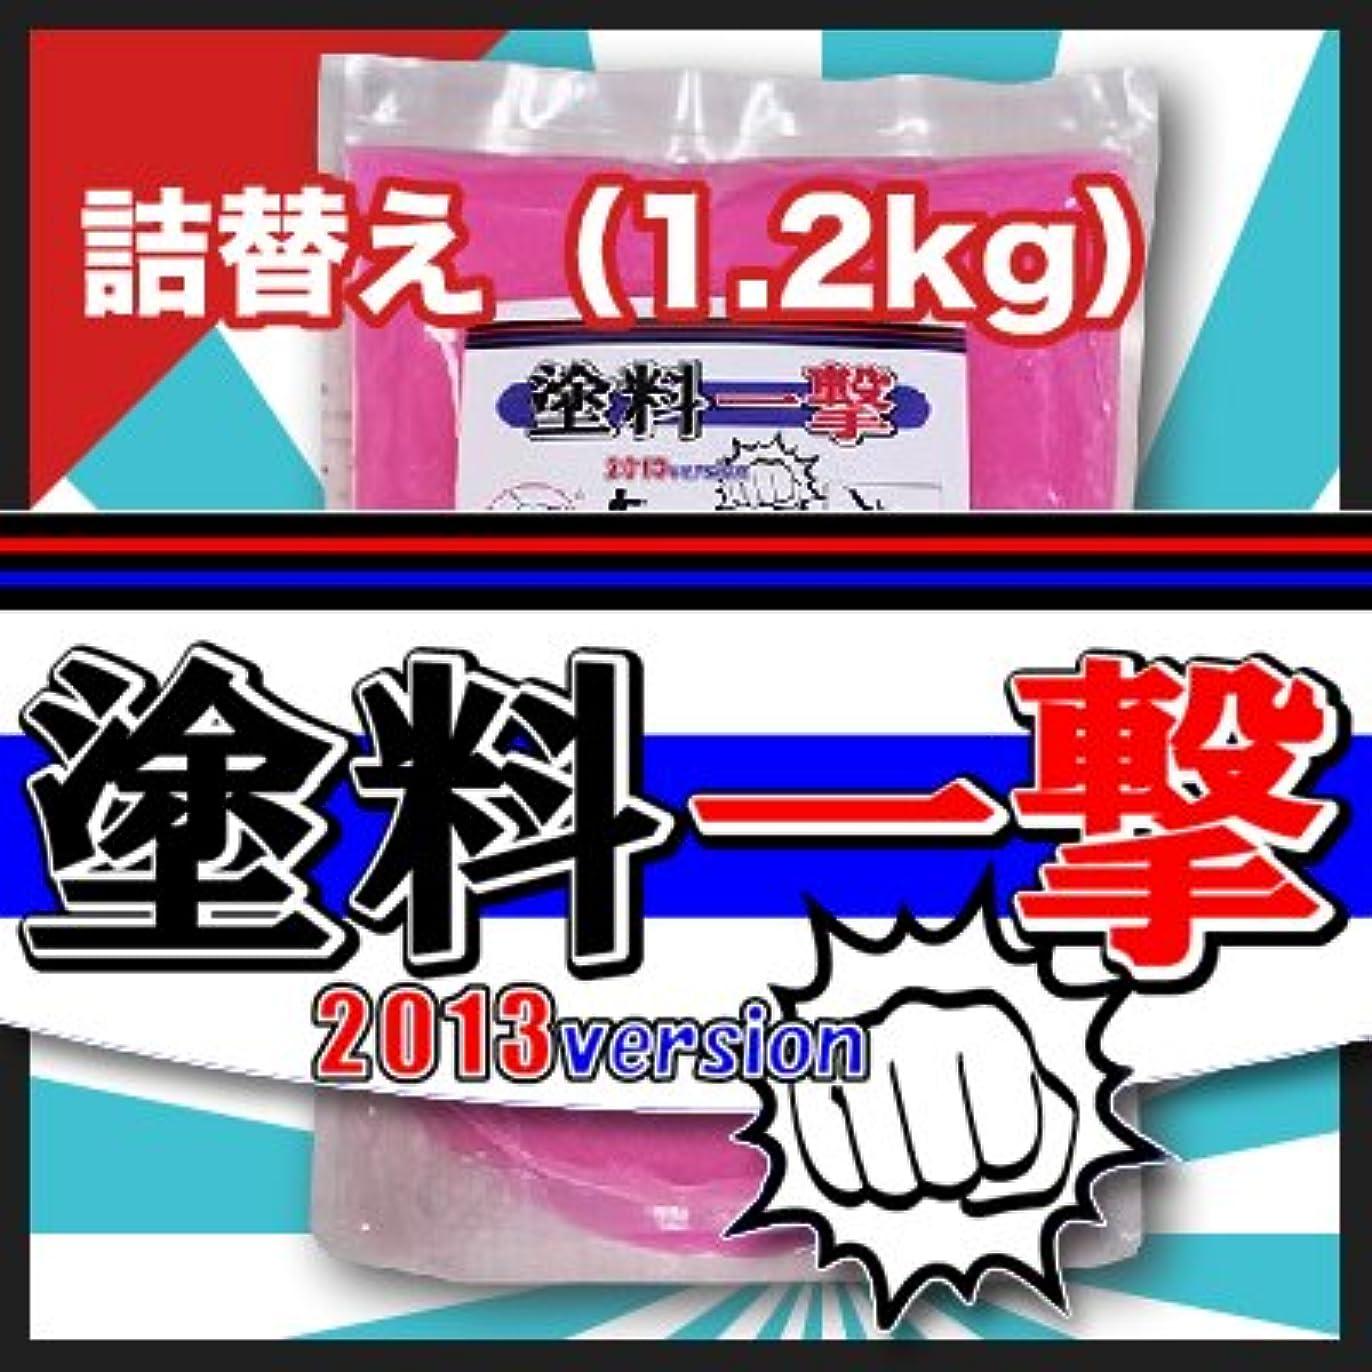 D.Iプランニング 塗料一撃 2013 Version 詰め替え (1.2kg)